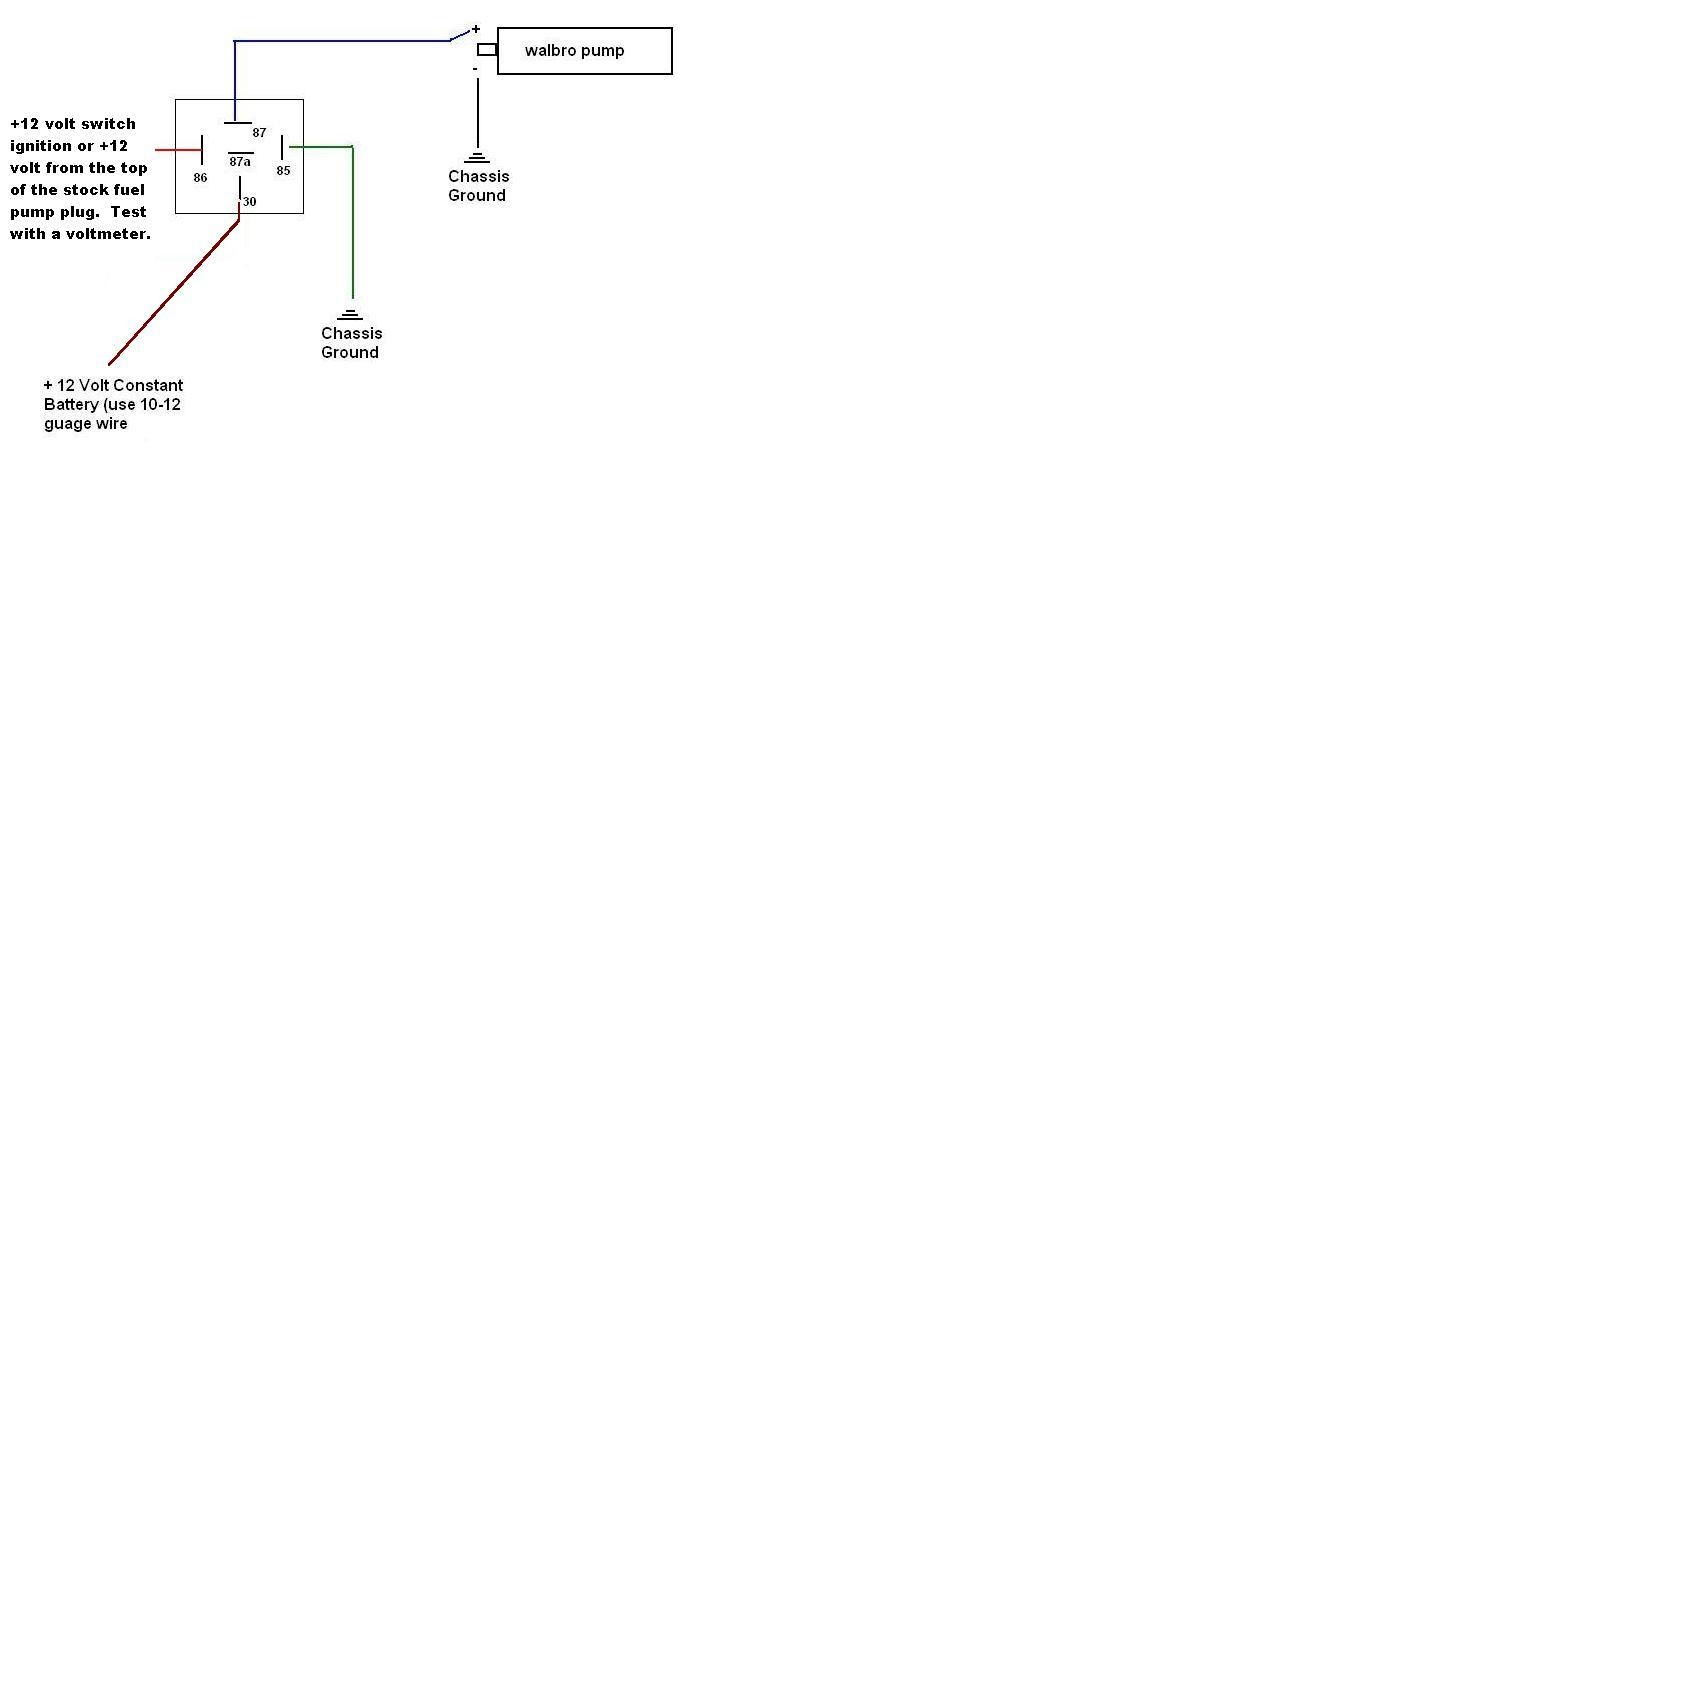 magnafuel duel relays ls1tech camaro and firebird forum discussion rh ls1tech com Bosch 12V Relay Wiring Diagram 1-Wire Alternator Wiring Diagram